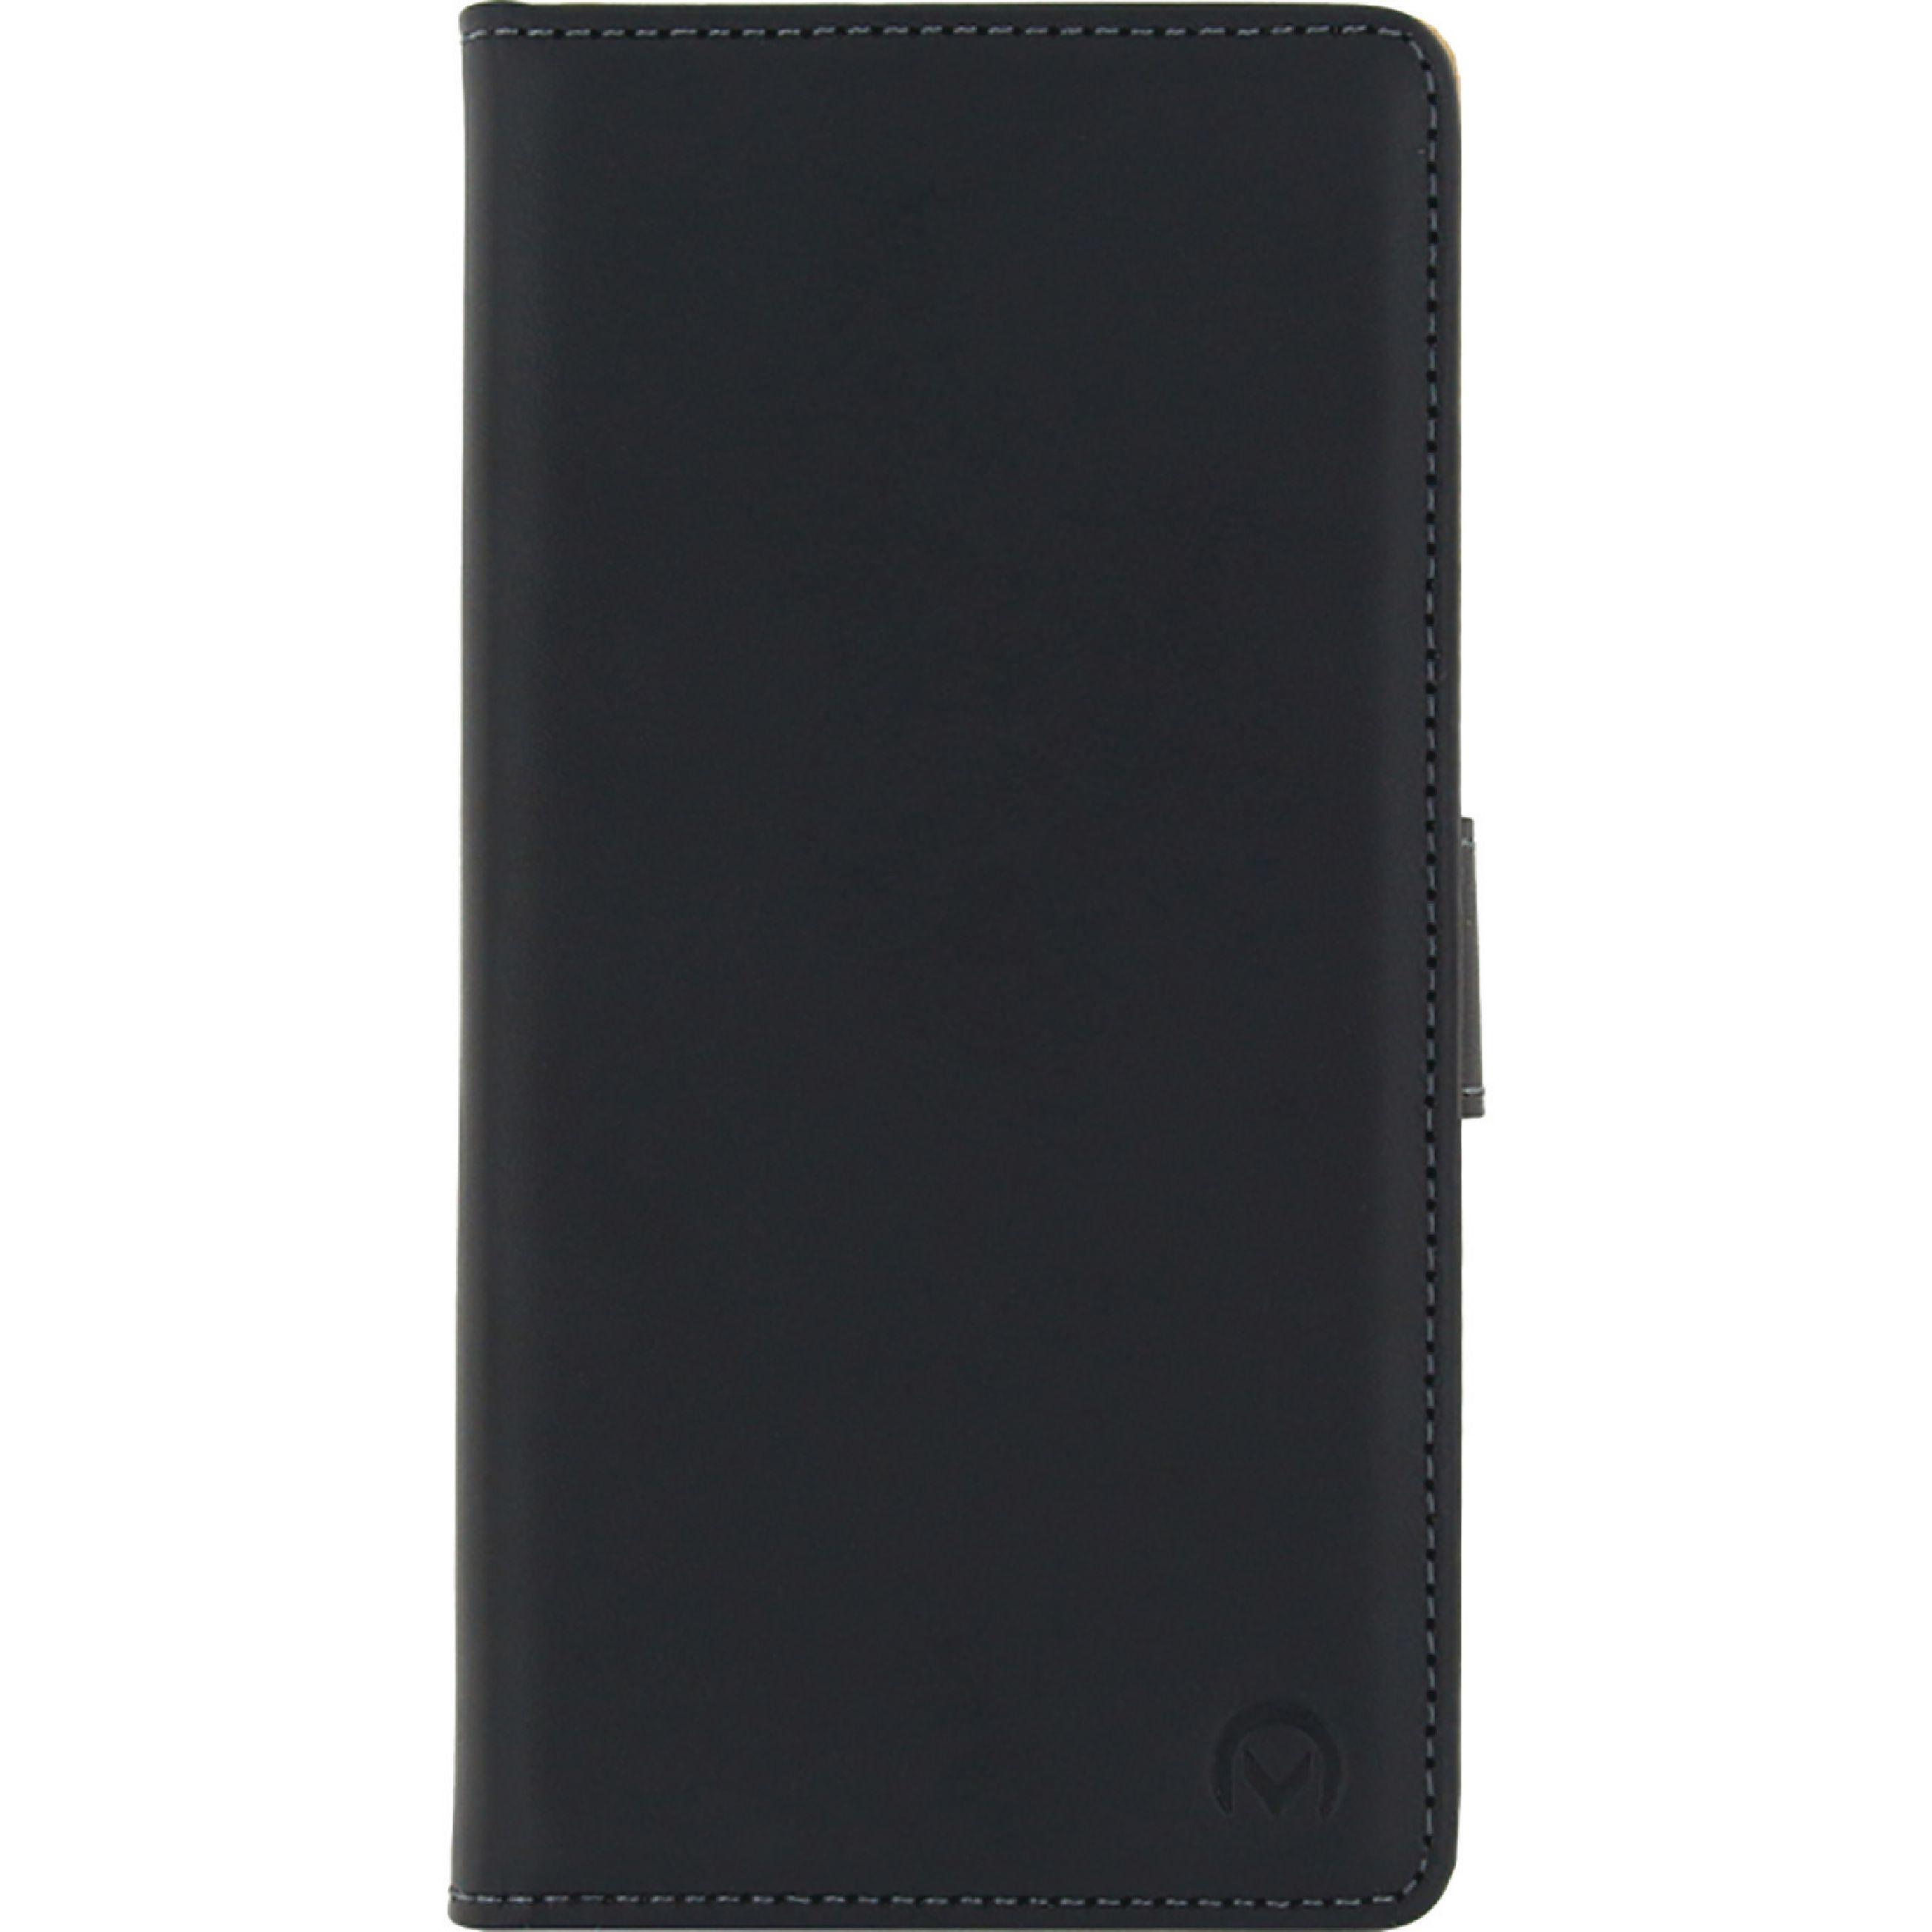 Image of   Telefon Klassisk Lommebogsetui LG G5 SE Sort